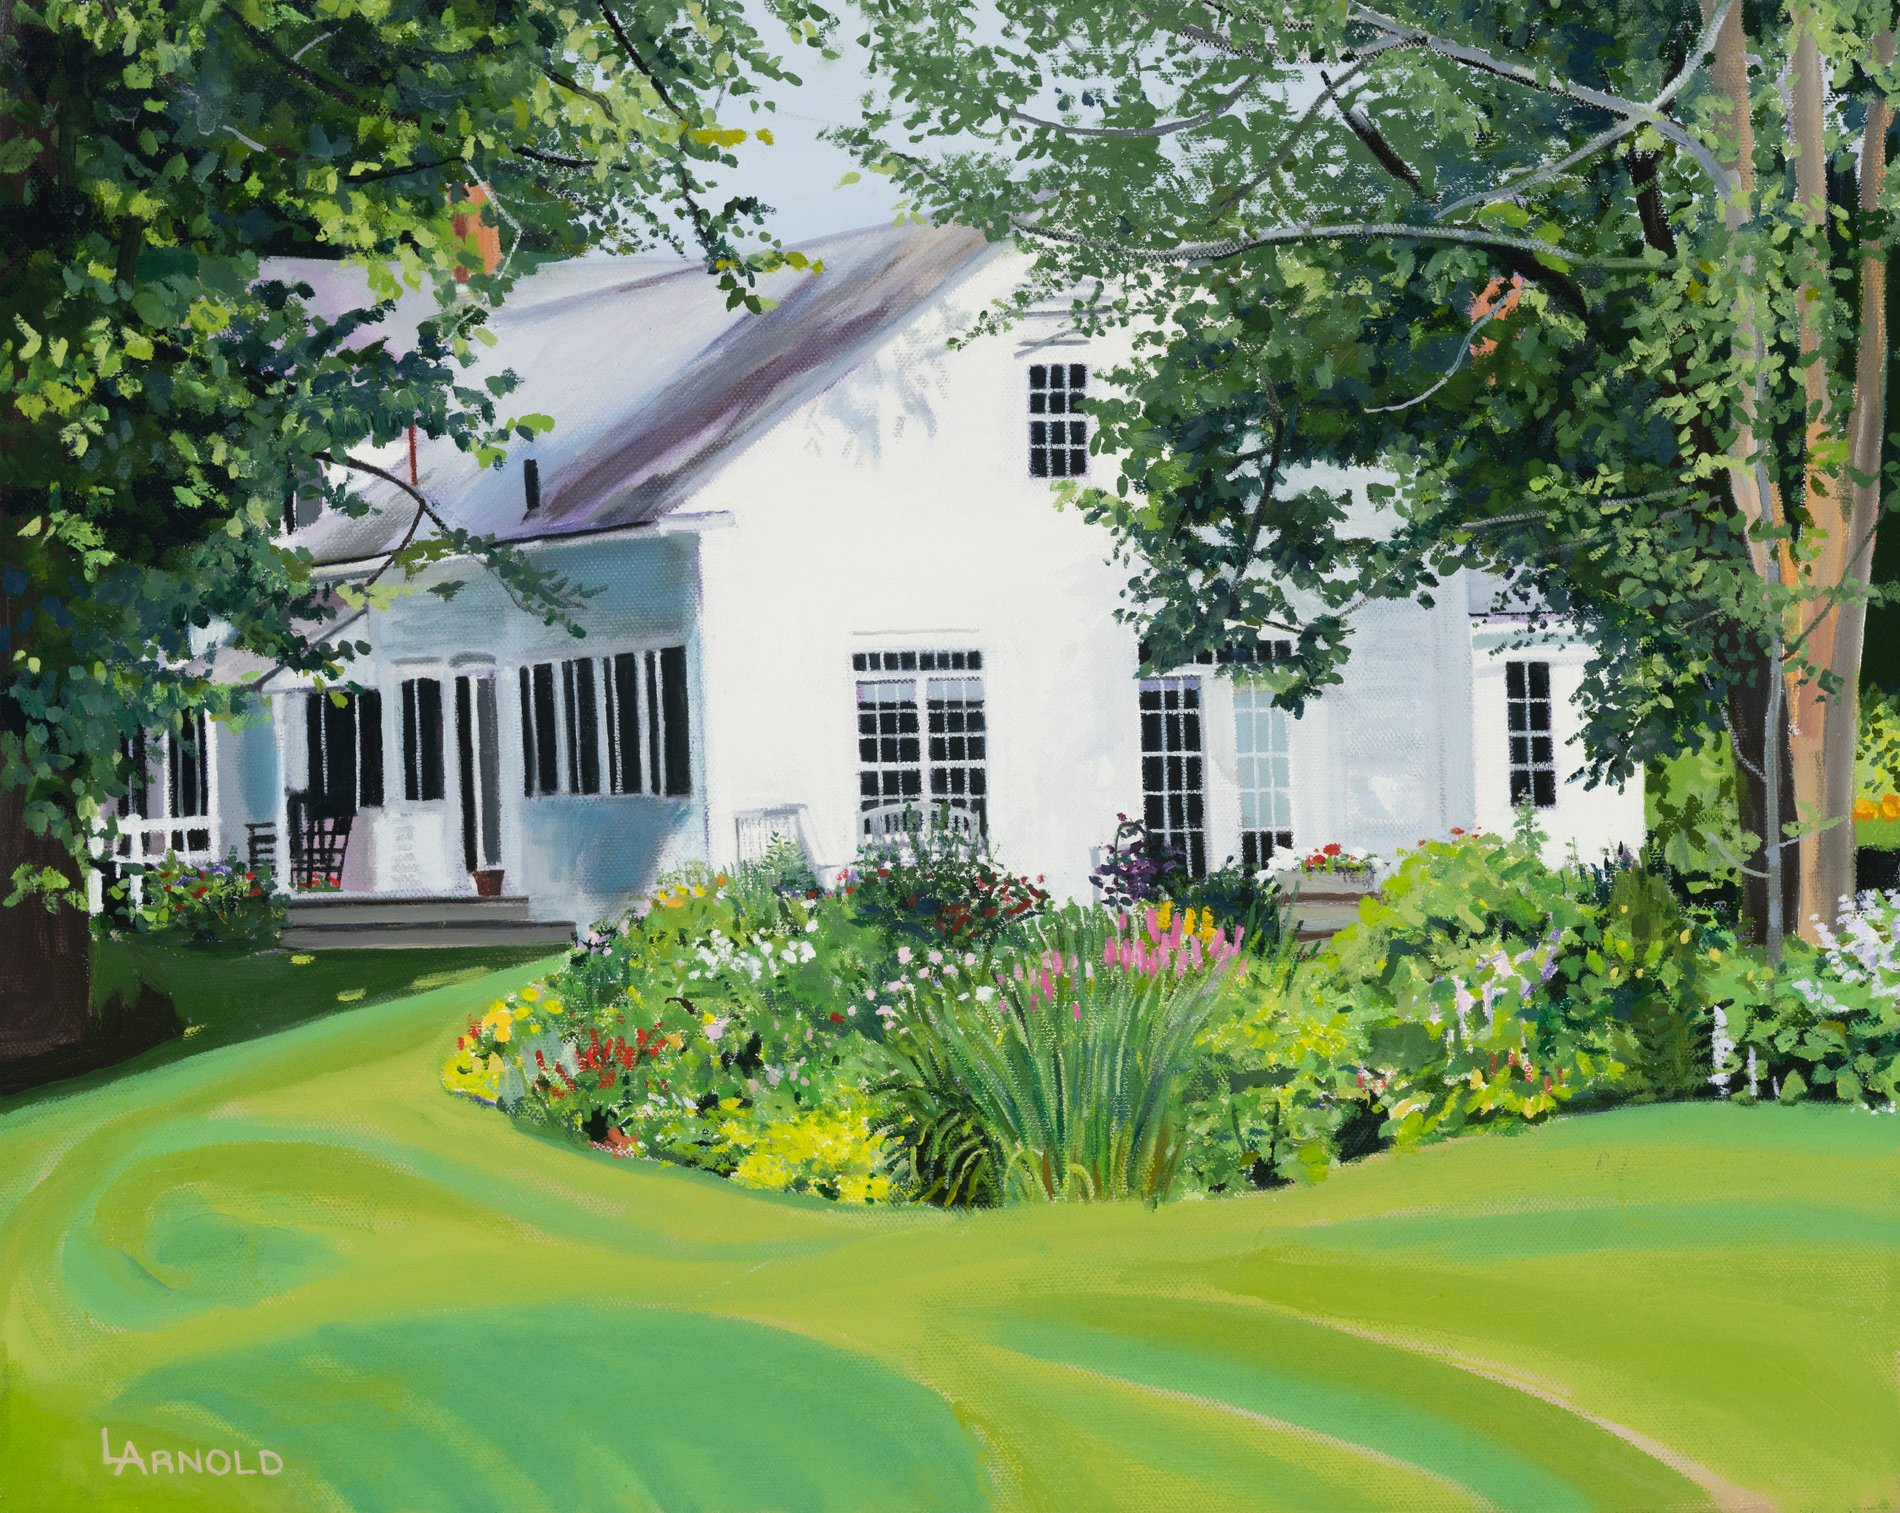 House and Garden, 16 x 20